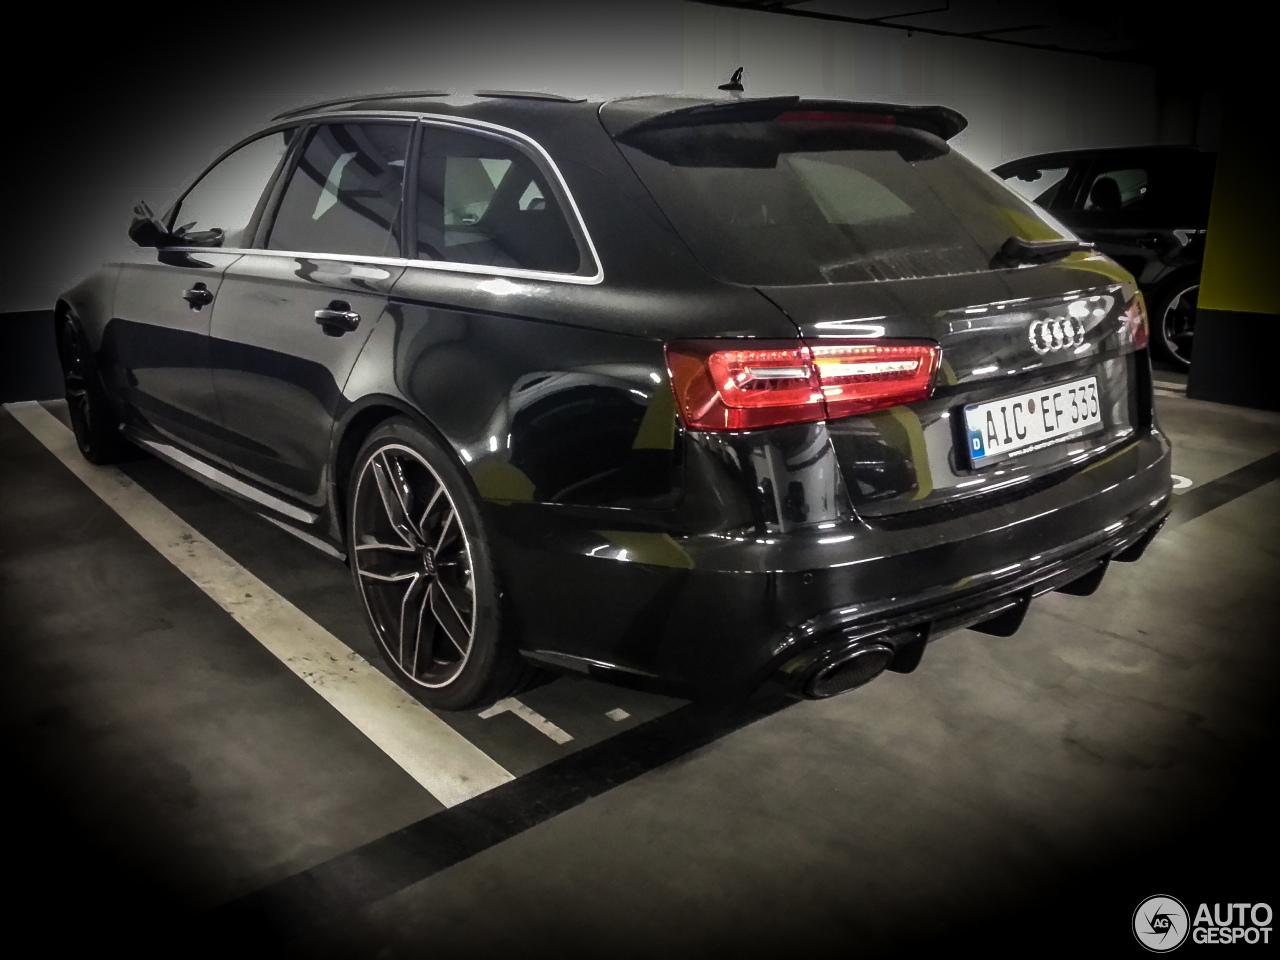 Audi Rs6 Avant C7 8 Oktober 2013 Autogespot